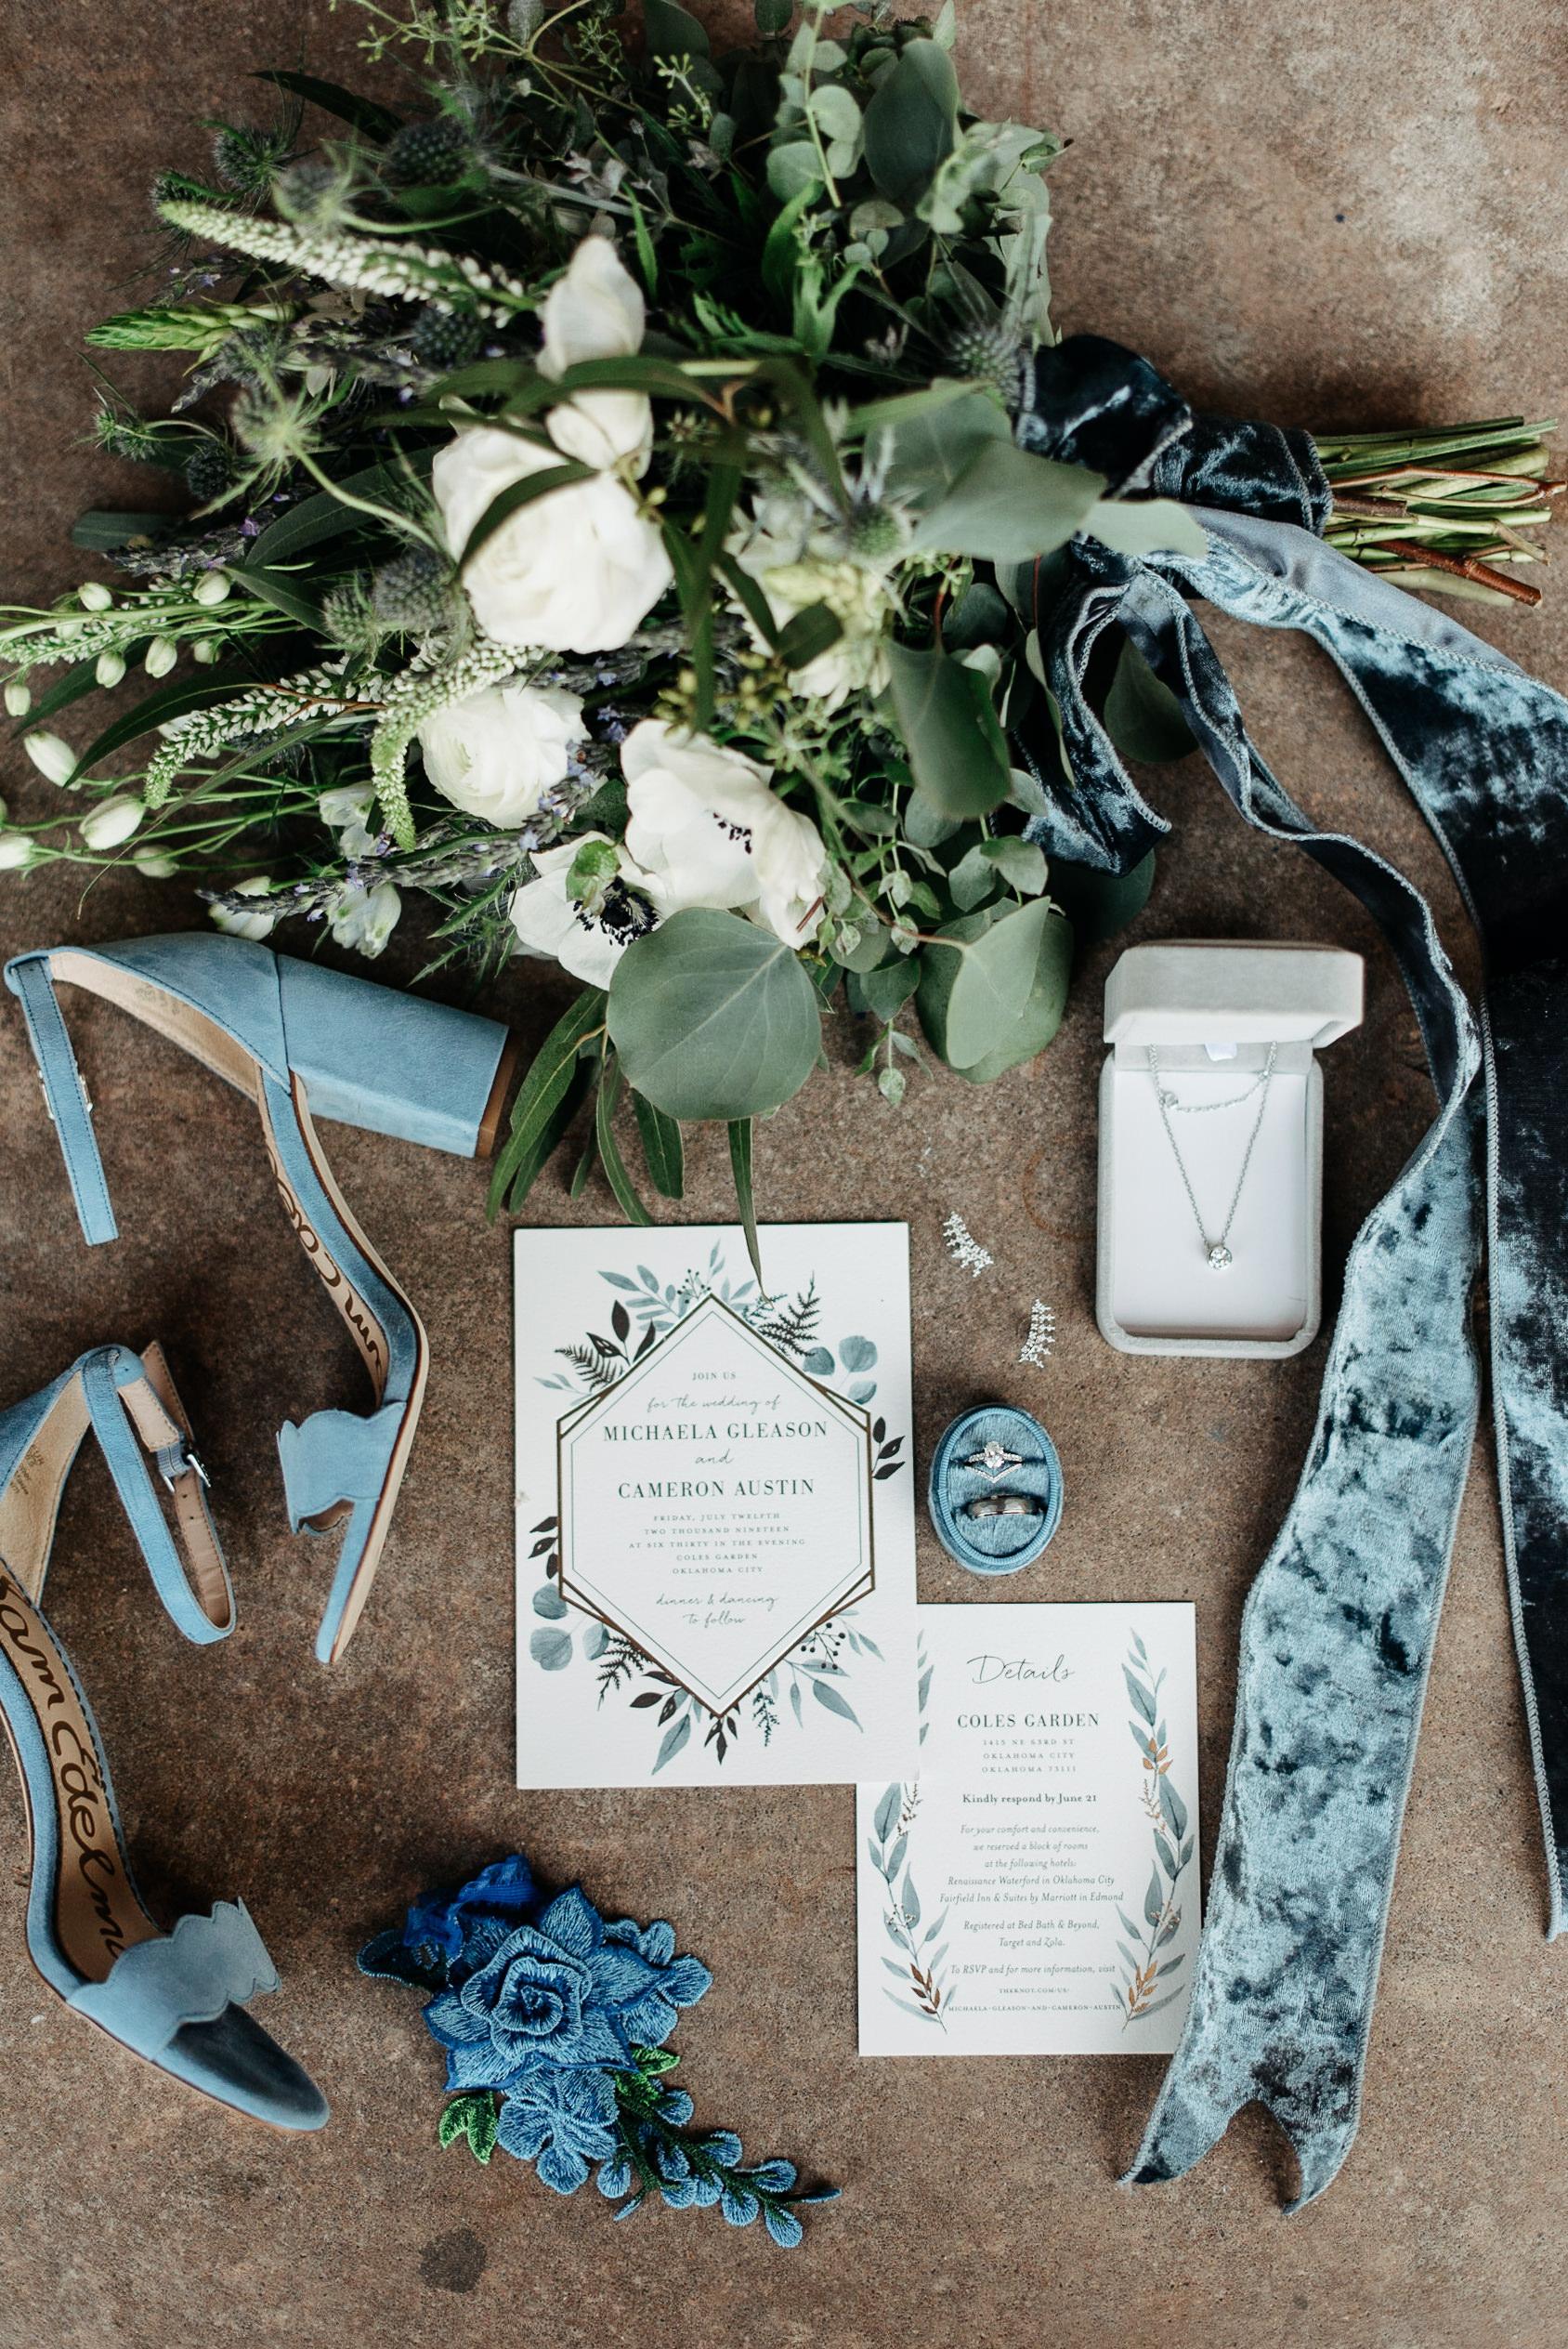 okc-wedding-photographer-coles-garden-wedding-okc-best-wedding-photographers-4.jpg